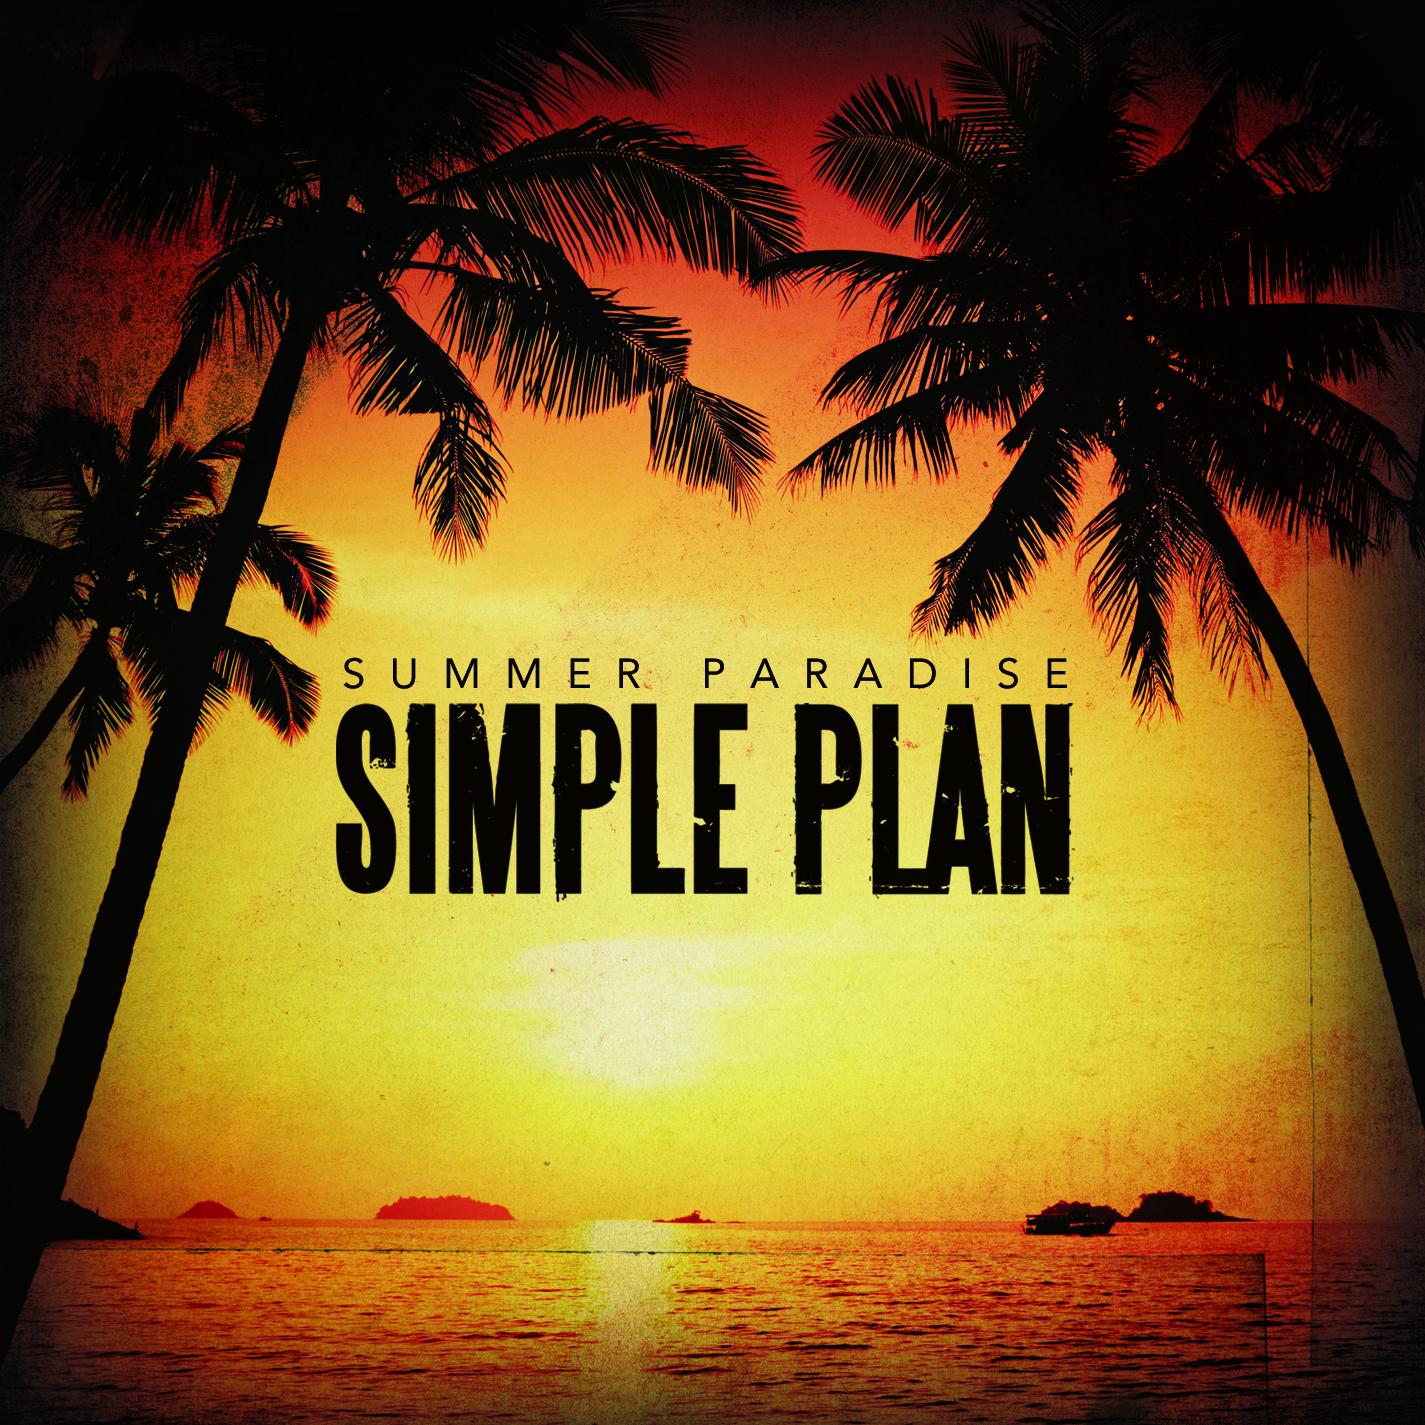 http://2.bp.blogspot.com/-6jlh0L8cGJE/Ty1l5t1SwAI/AAAAAAAABSU/Axal7_akZjg/s1600/SimplePlan-SummerParadise_cover.jpg